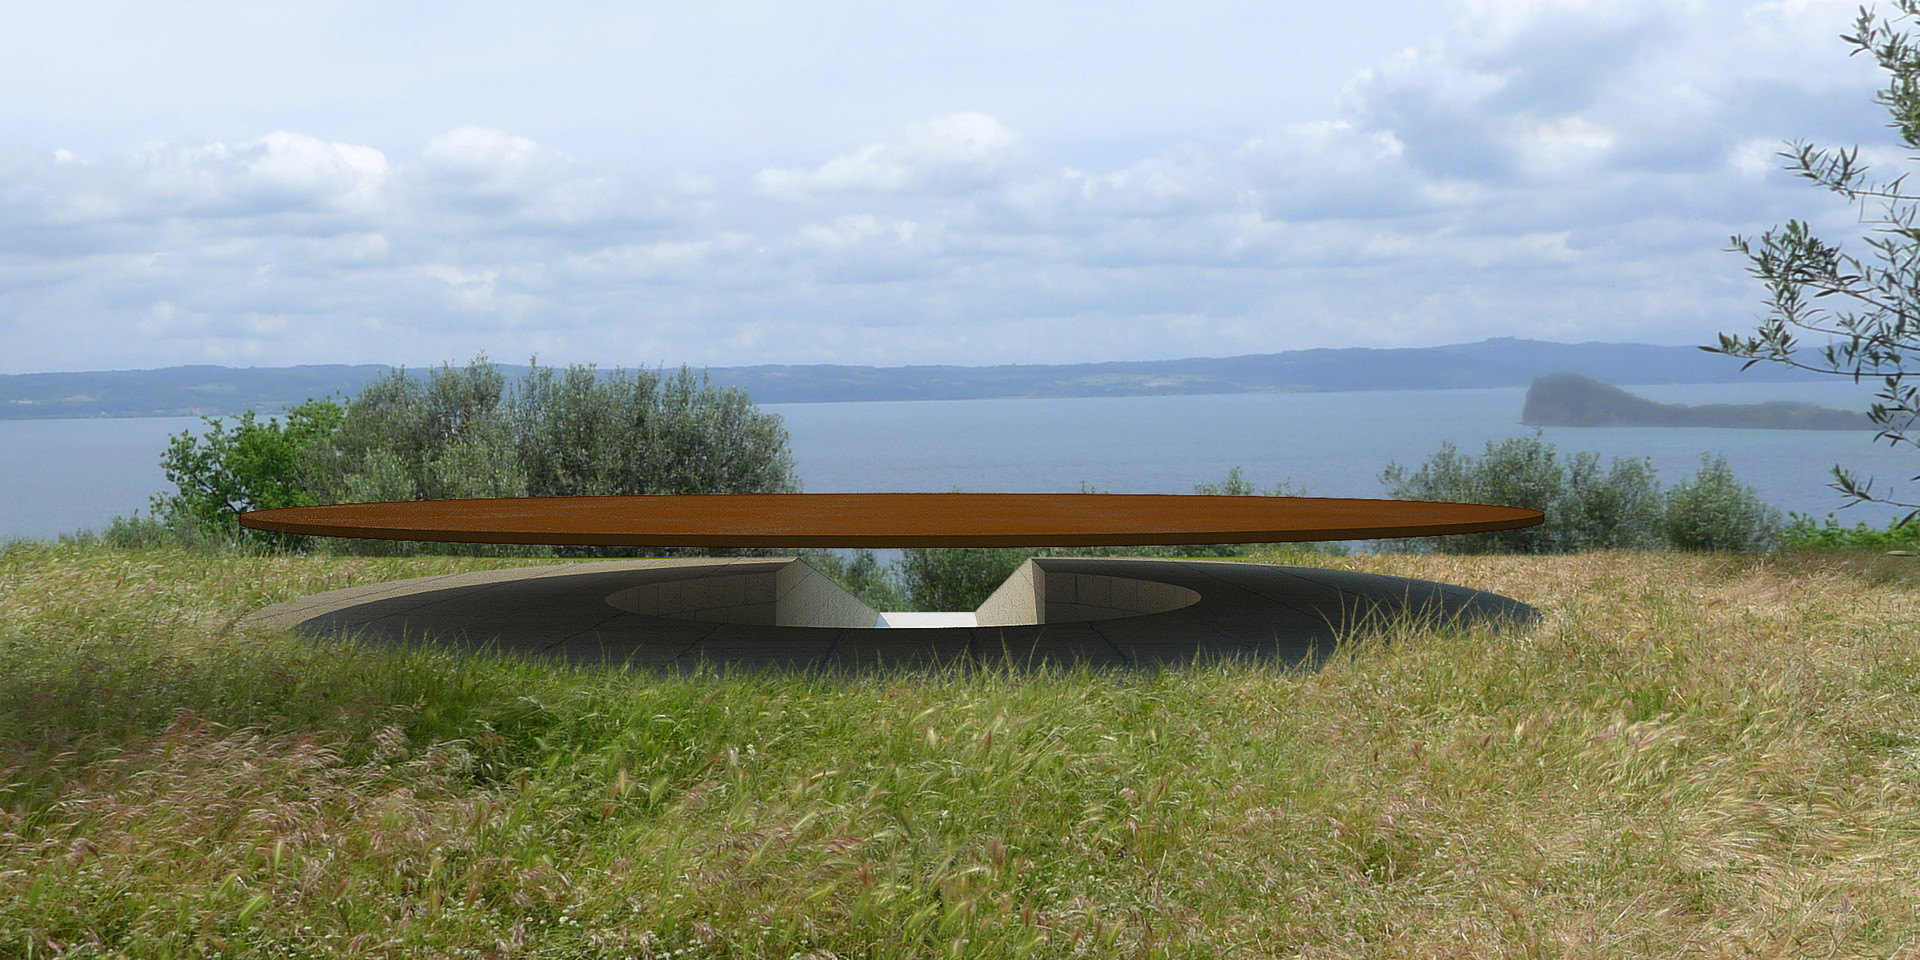 Land Art Villa Caviciana Ben Dieckmann architects